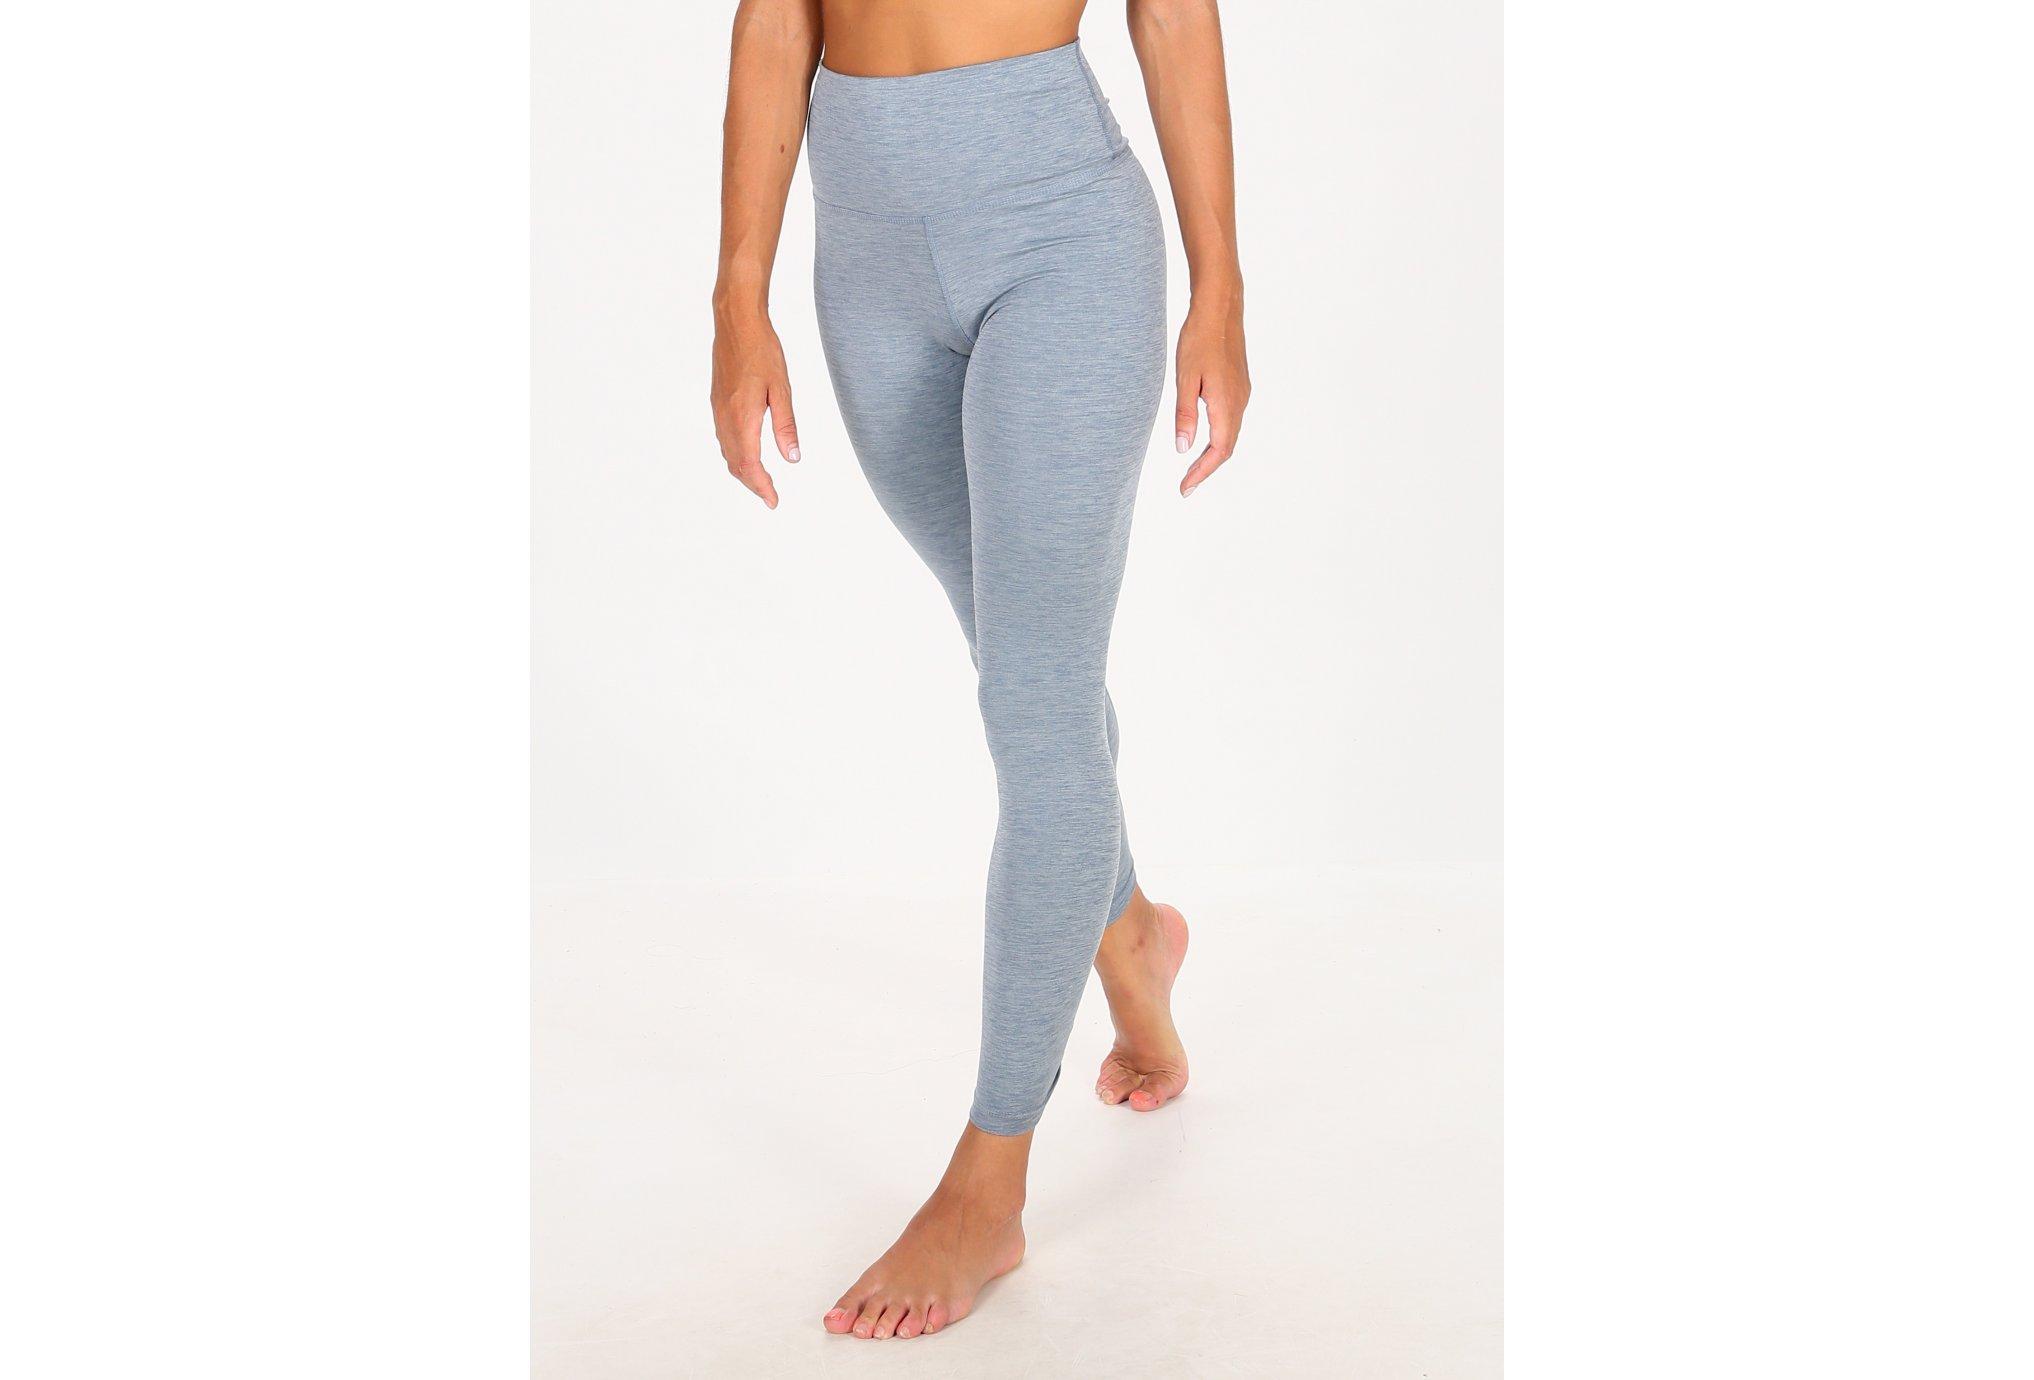 Nike Yoga Ruche 7/8 W vêtement running femme